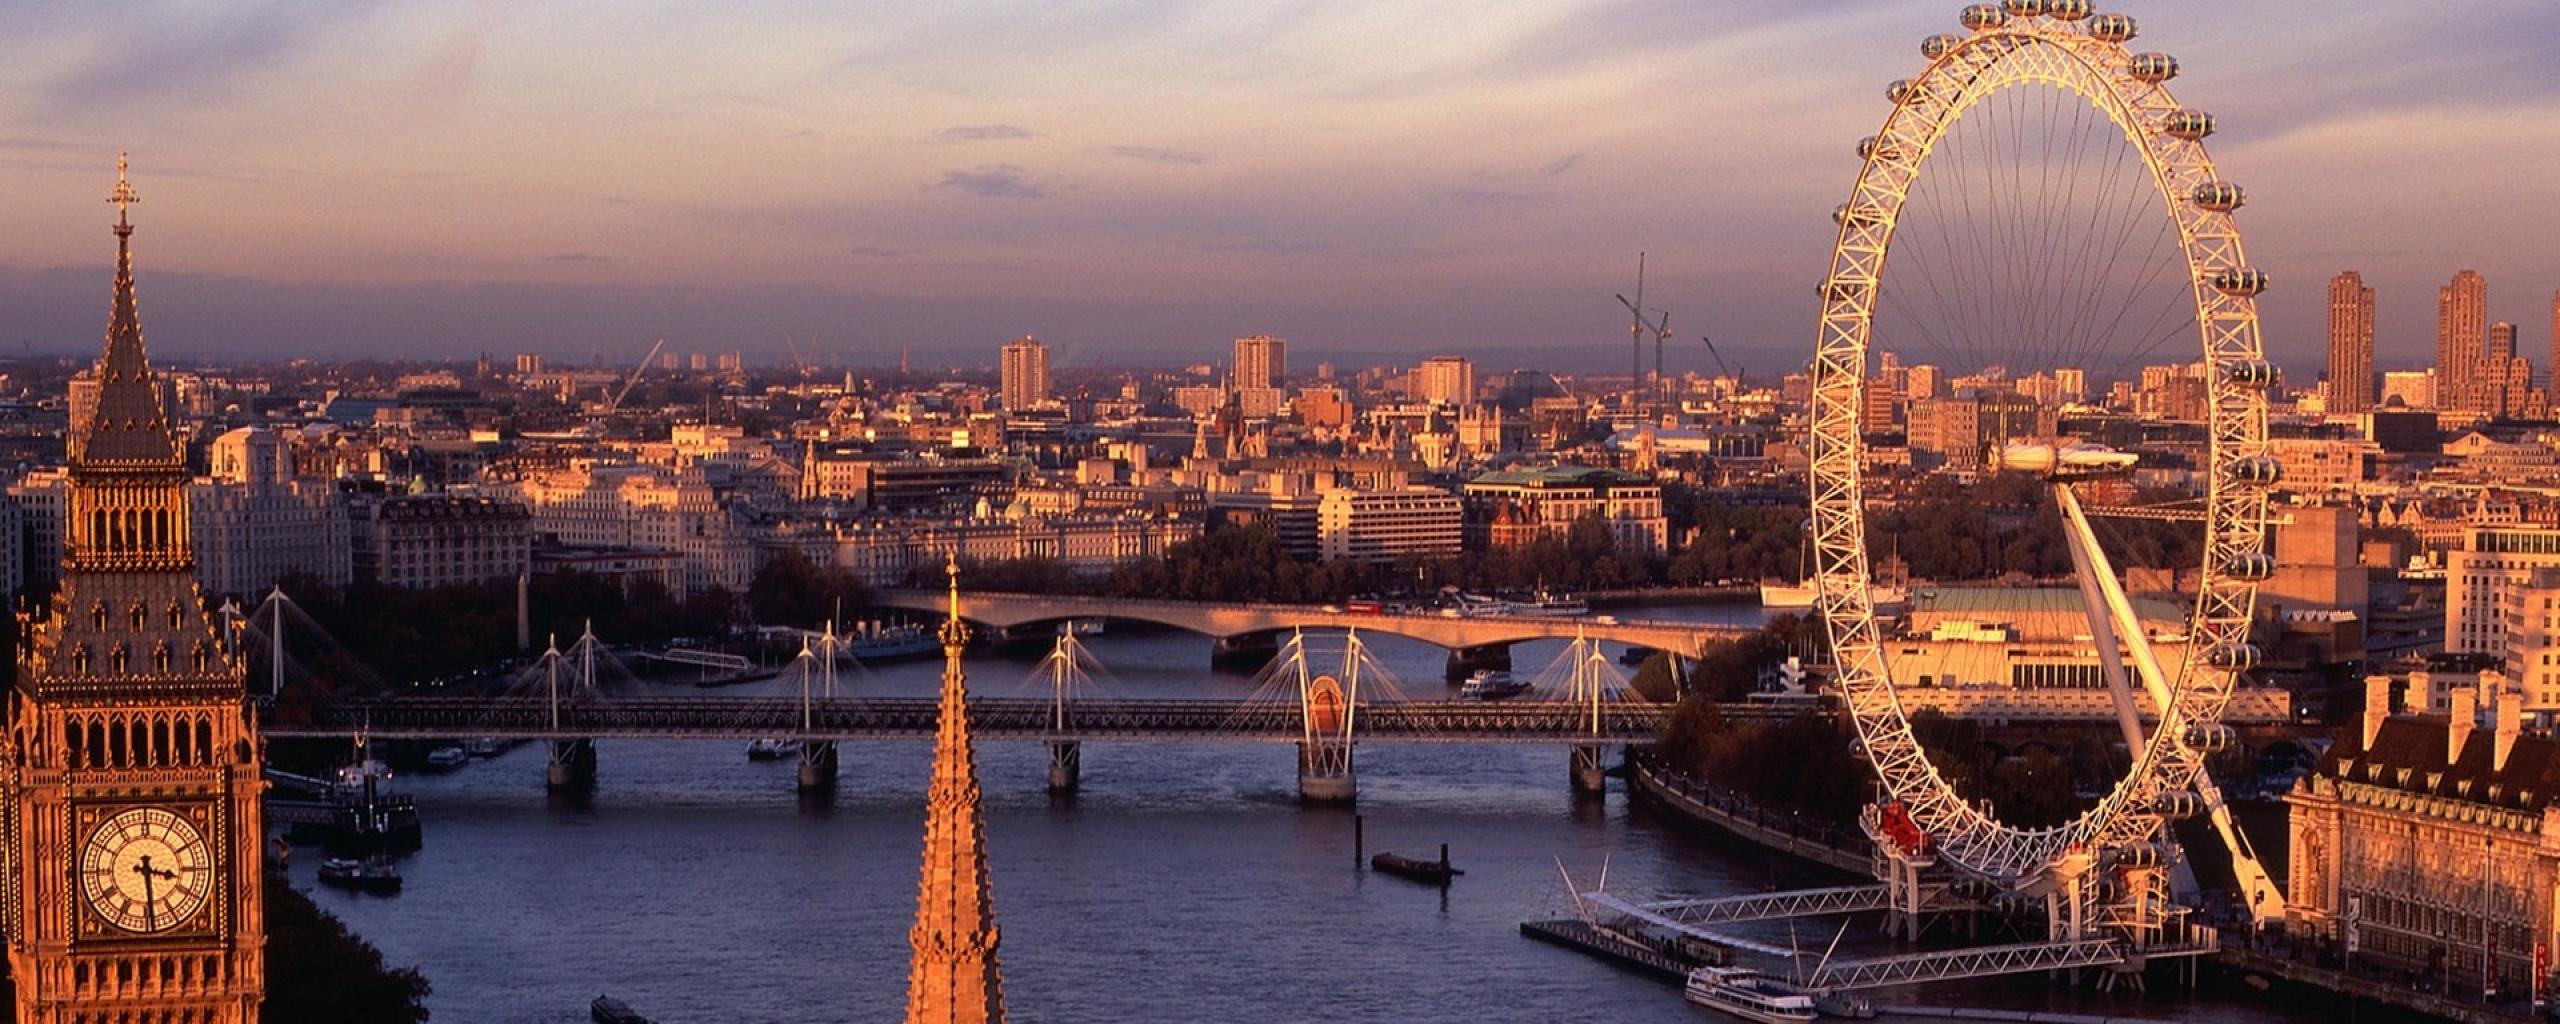 london_england_river_bridge_big_ben_ferris_wheel_47850_2560x1024